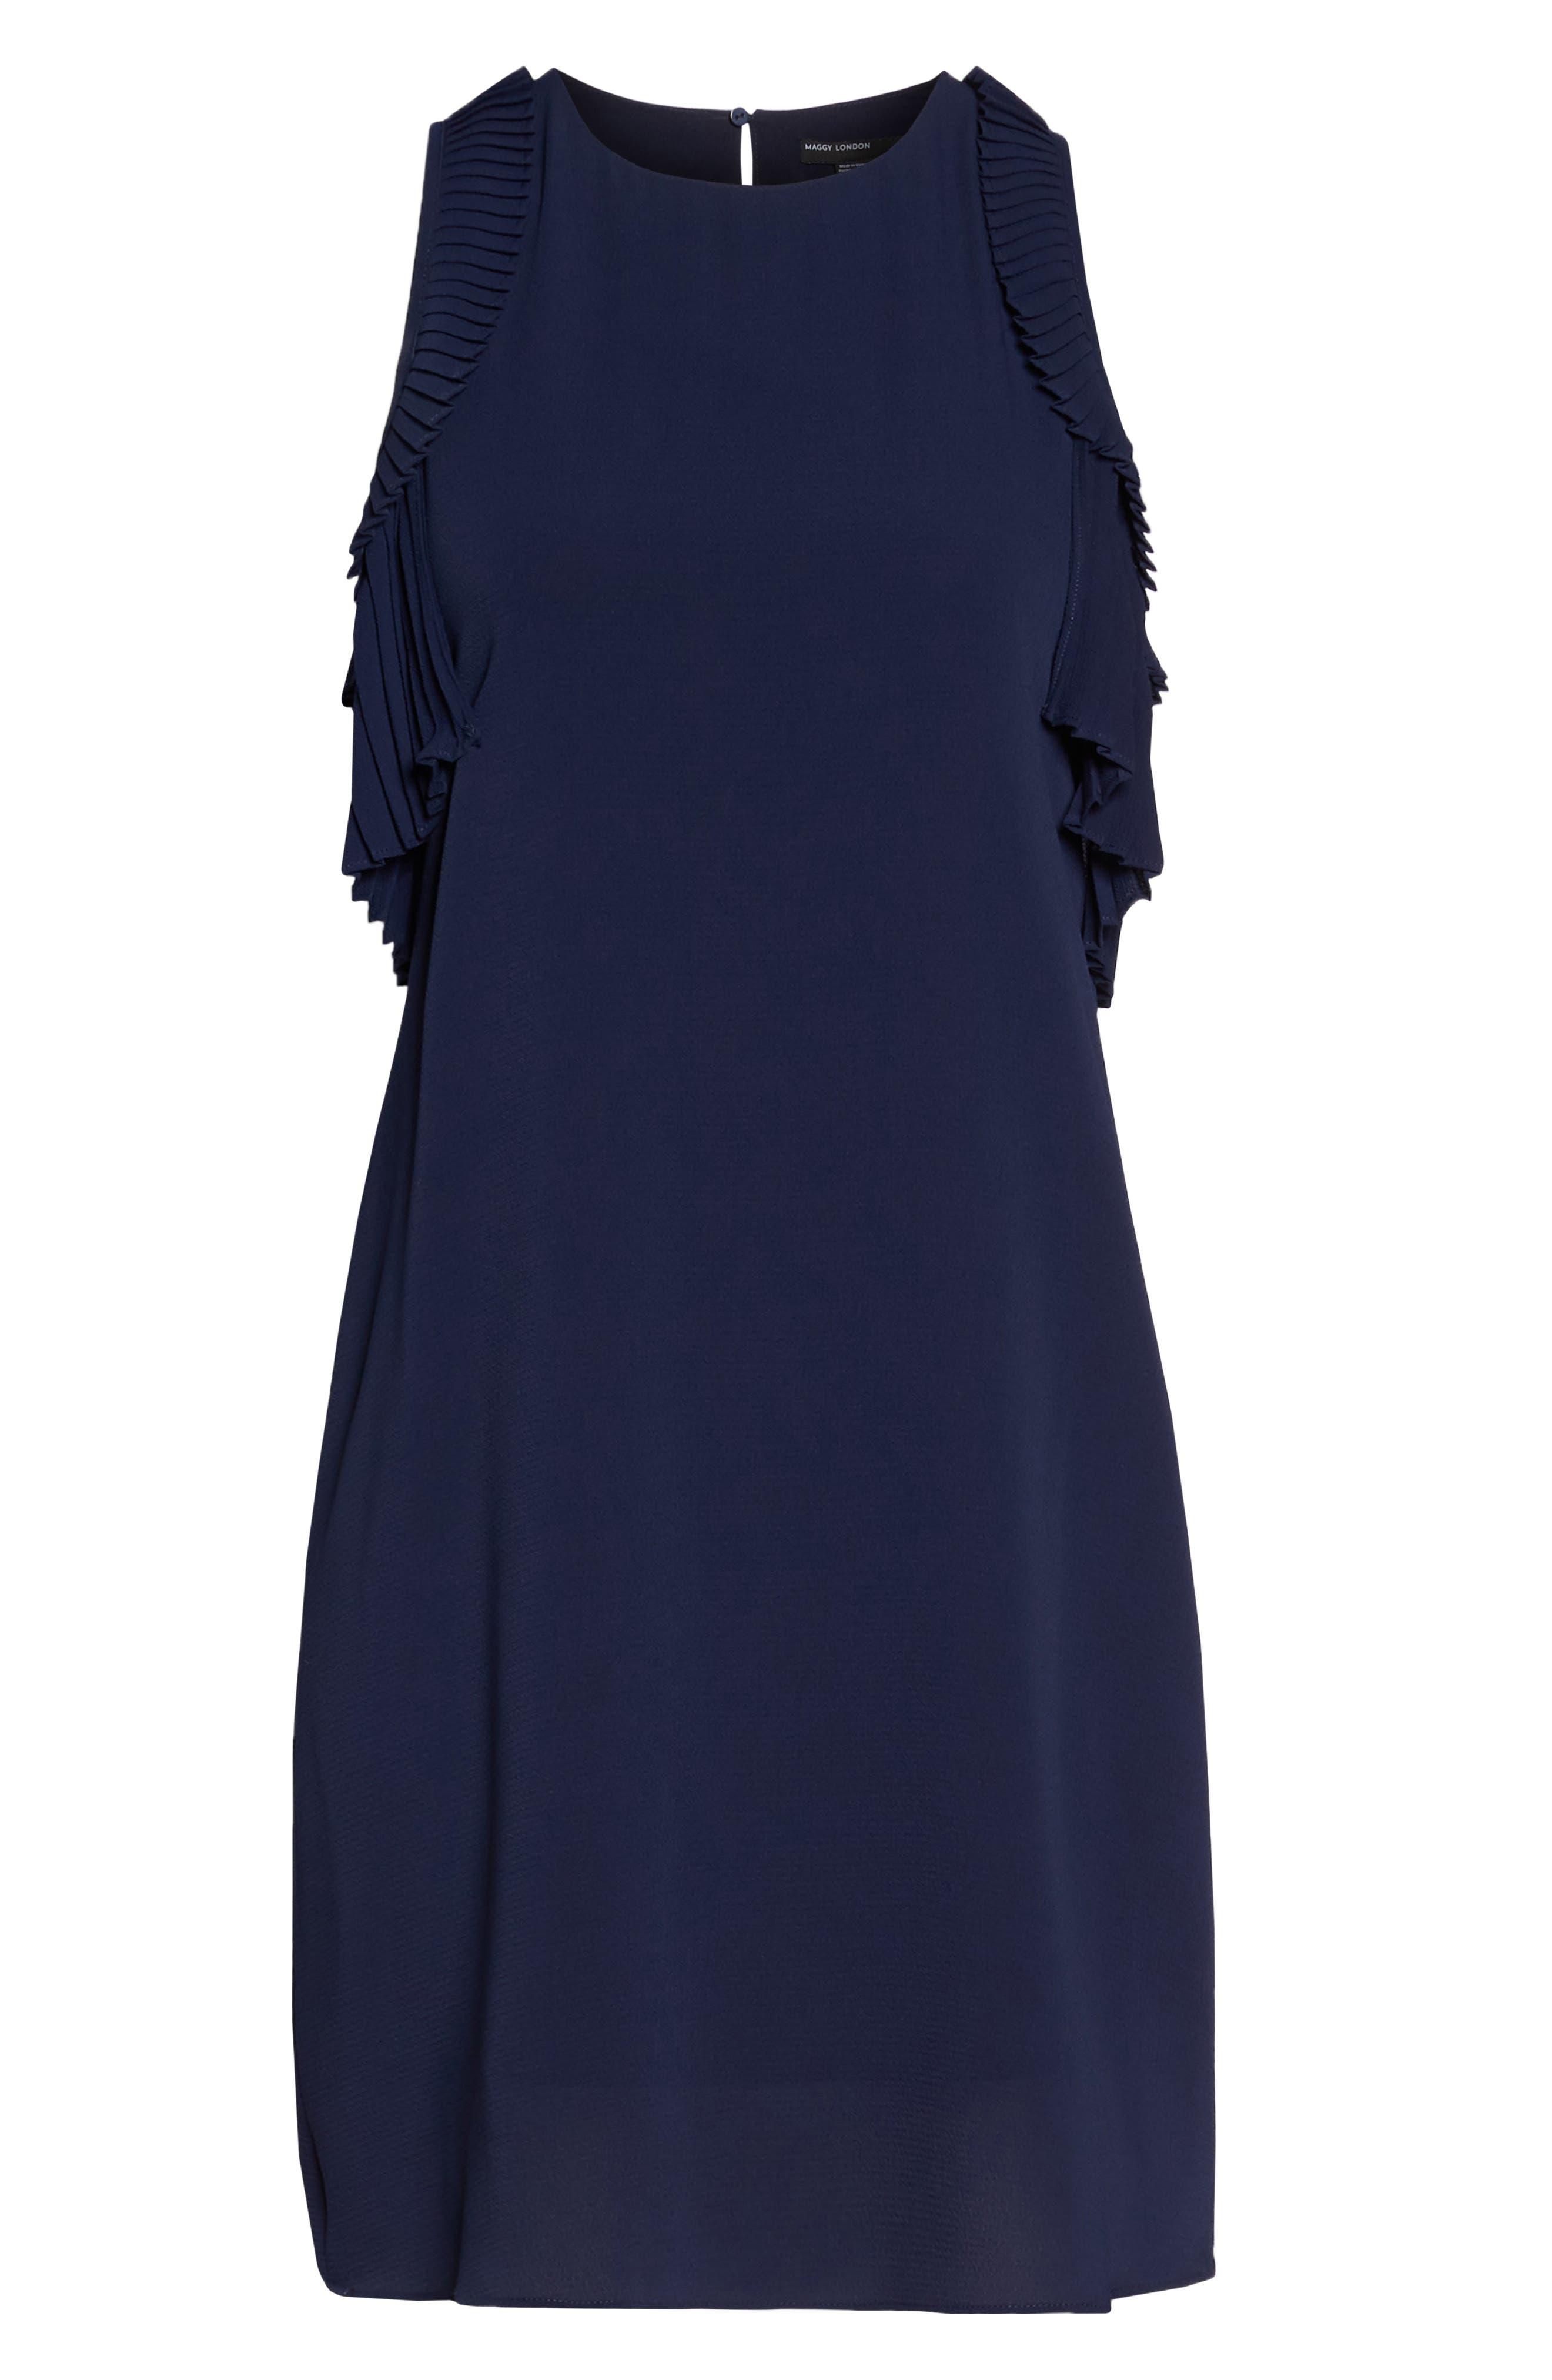 Cold Shoulder Shift Dress,                             Alternate thumbnail 7, color,                             Galaxy Blue